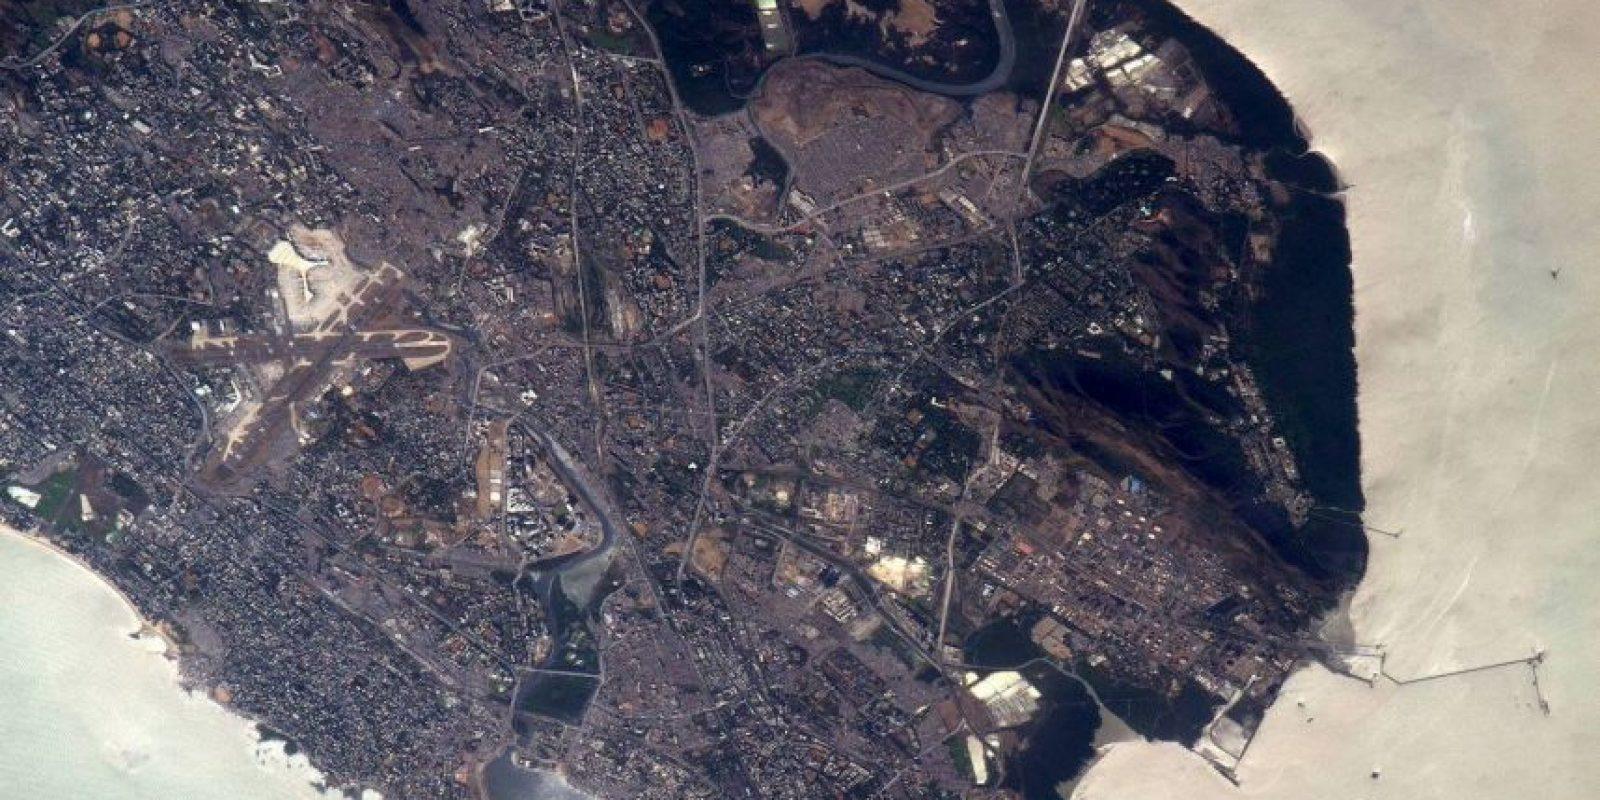 Así luce Bombay, en India. Foto:Facebook.com/pages/NASA-Astronaut-Scott-Kelly